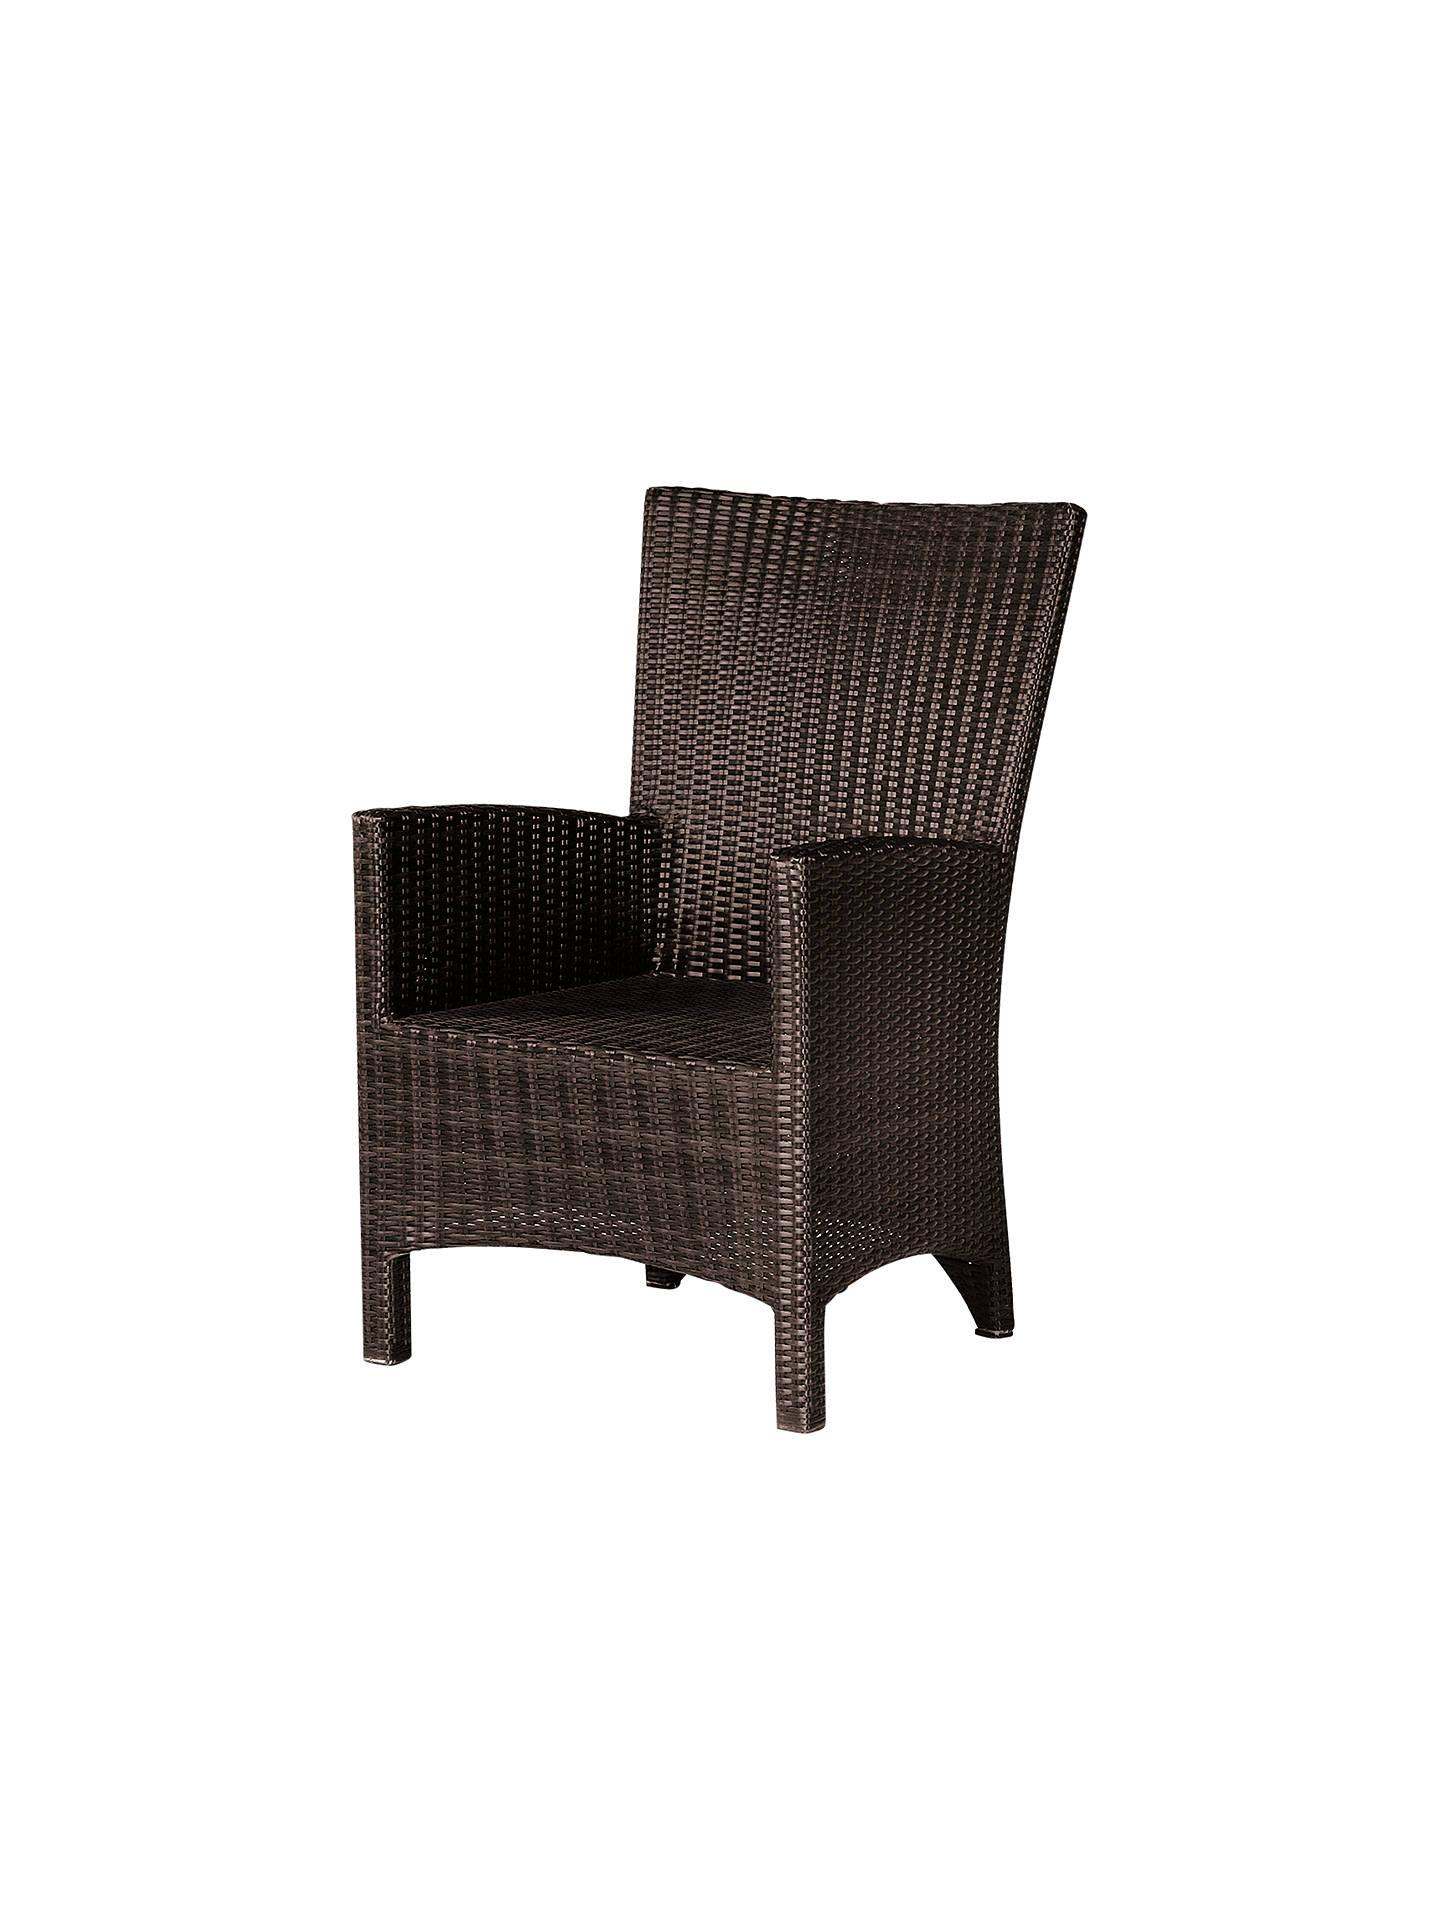 Buybarlow tyrie savannah outdoor dining armchair natural online at johnlewis com